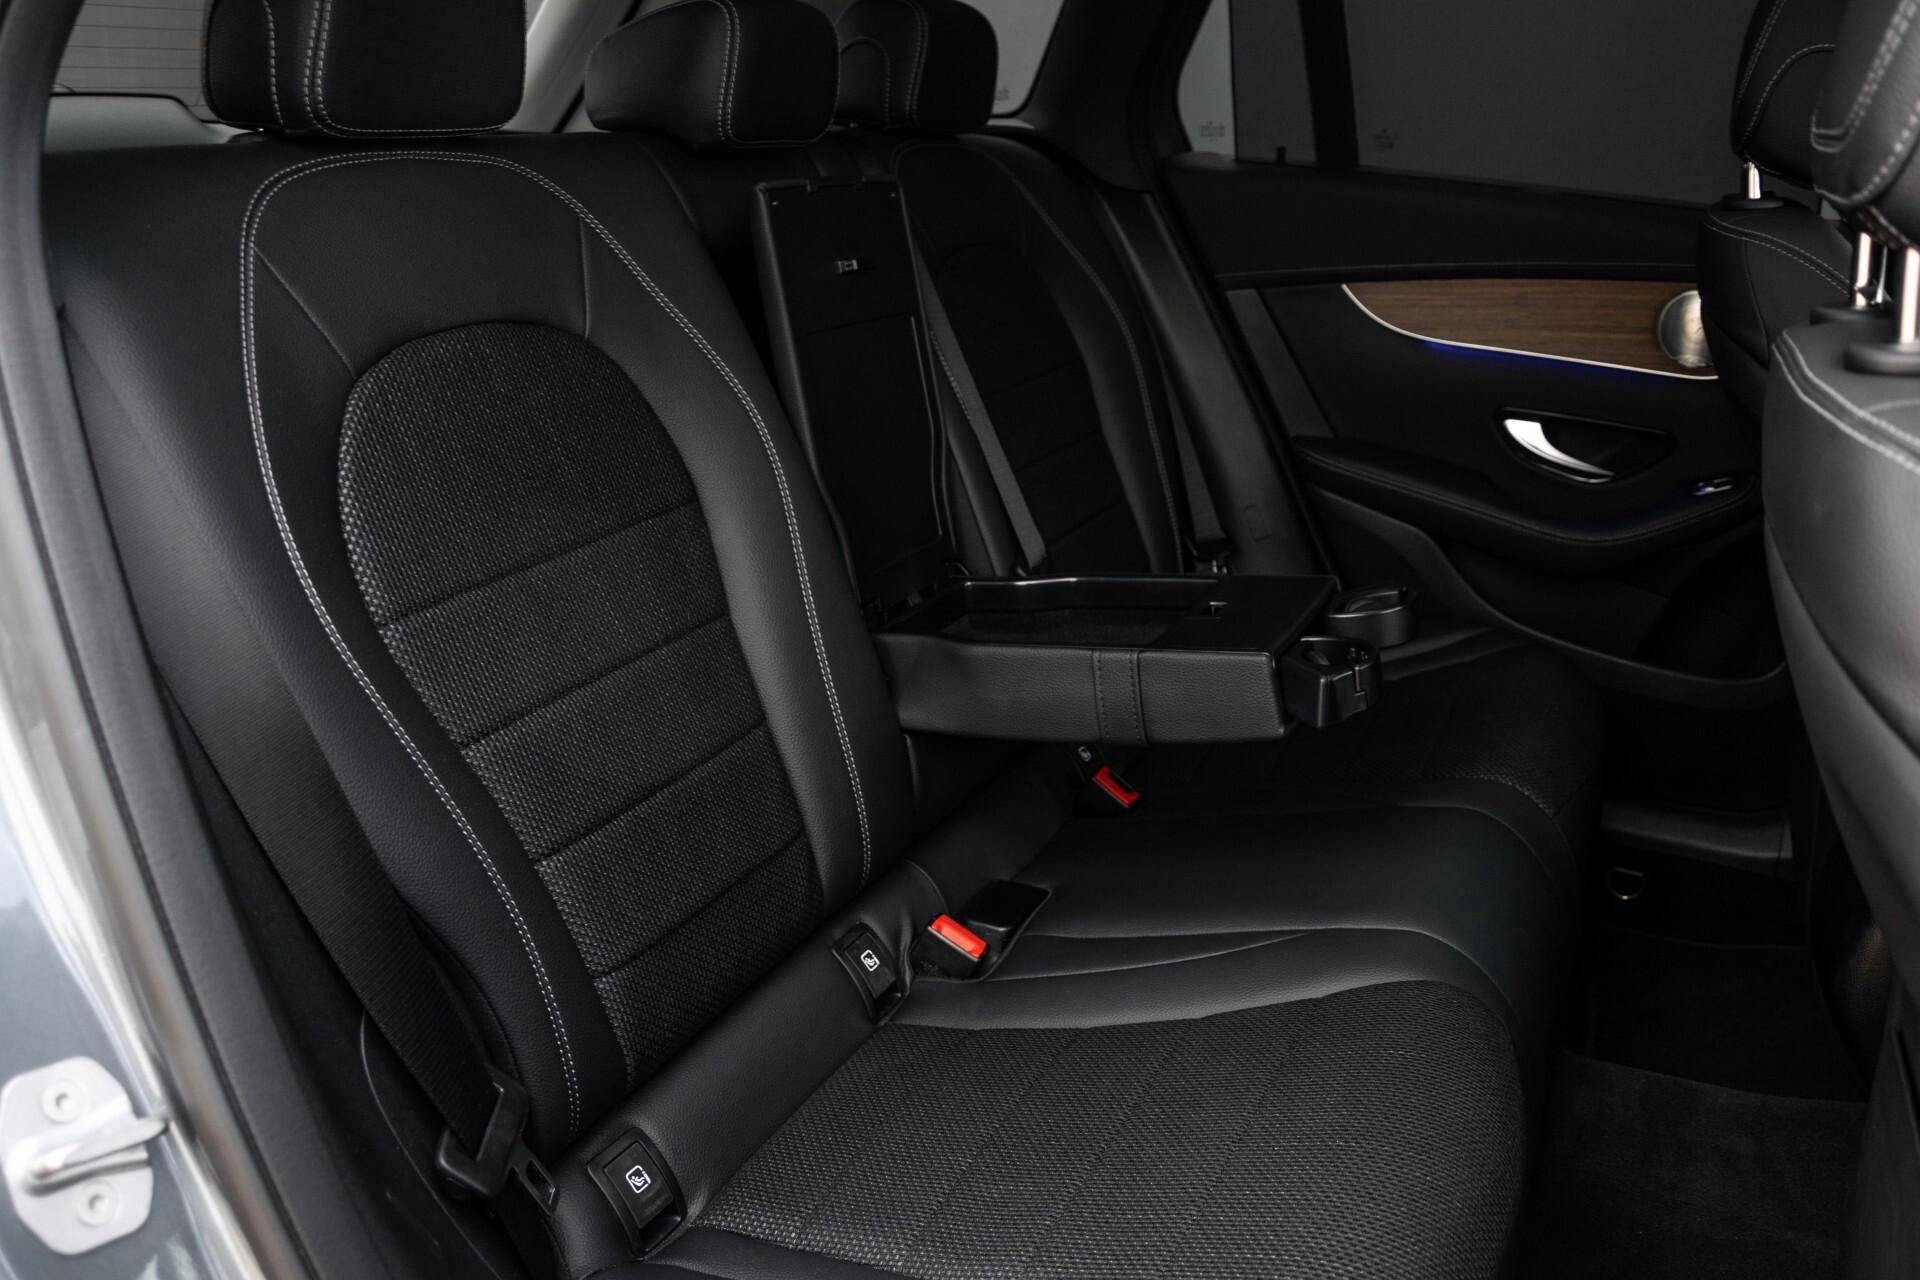 Mercedes-Benz GLC 300e 4-M Luchtvering/Panorama/Multicontourstoelen/Rij-assistentie/Standkachel Aut9 Foto 6